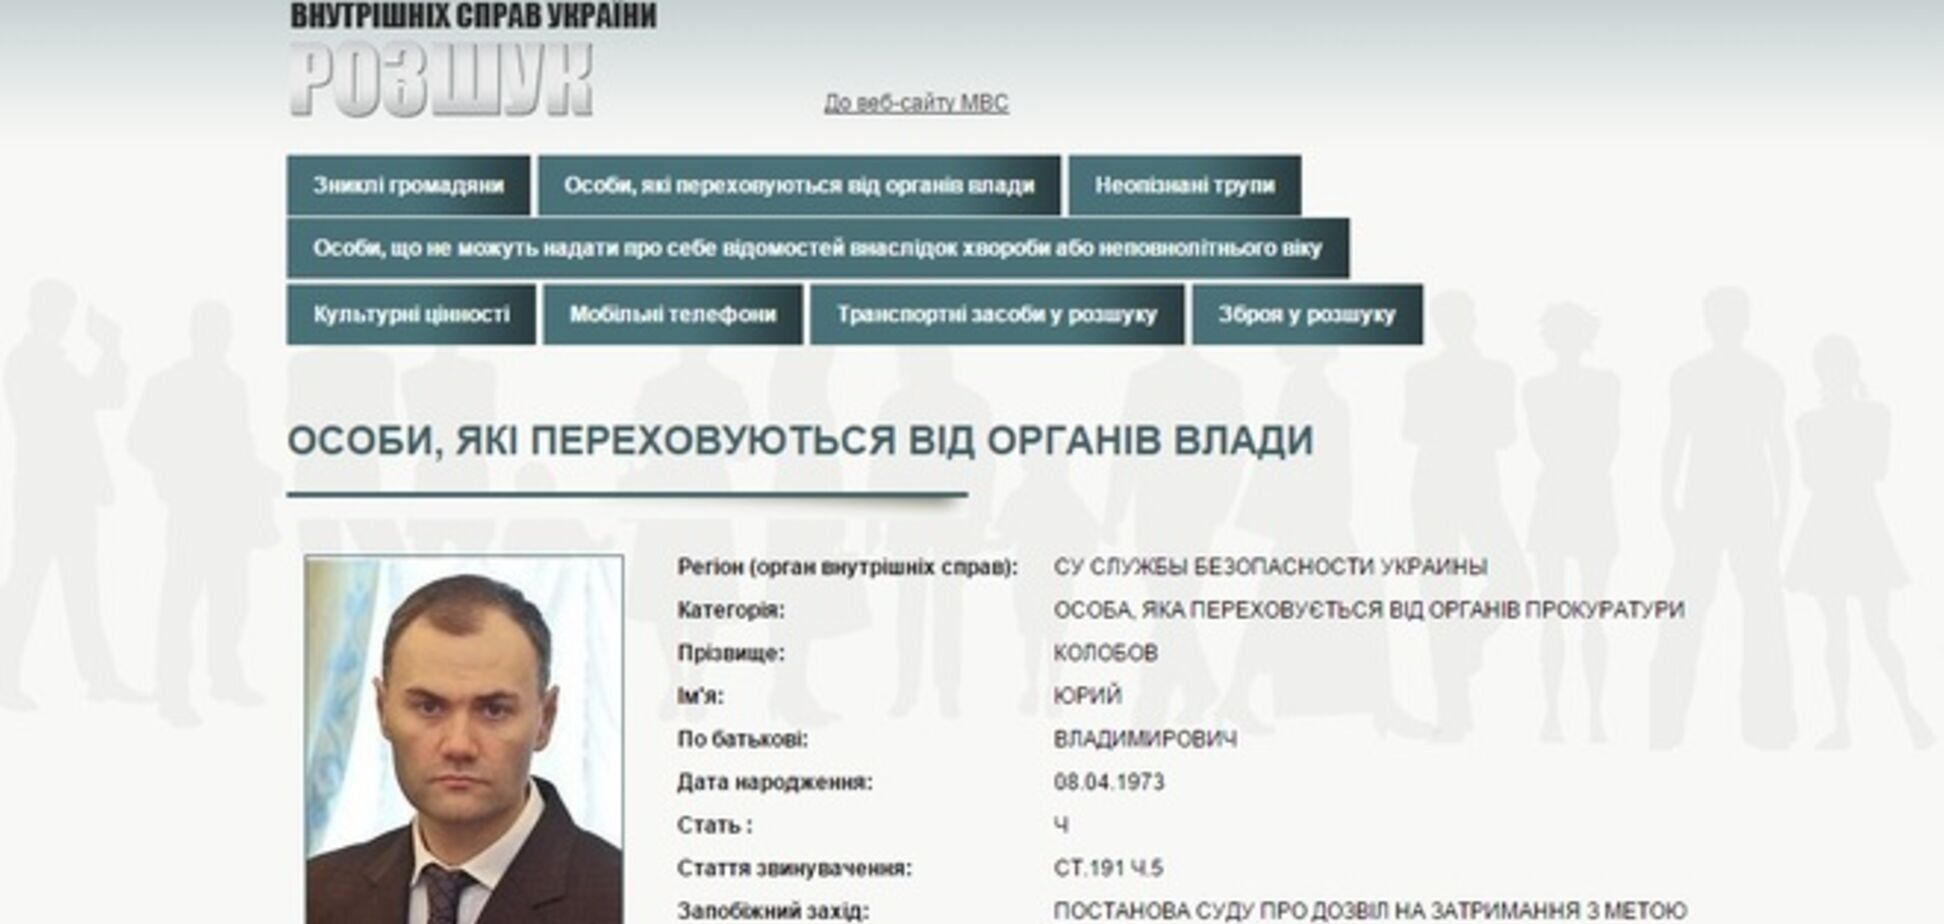 СБУ оголосила в розшук екс-главу Мінфіну Колобова